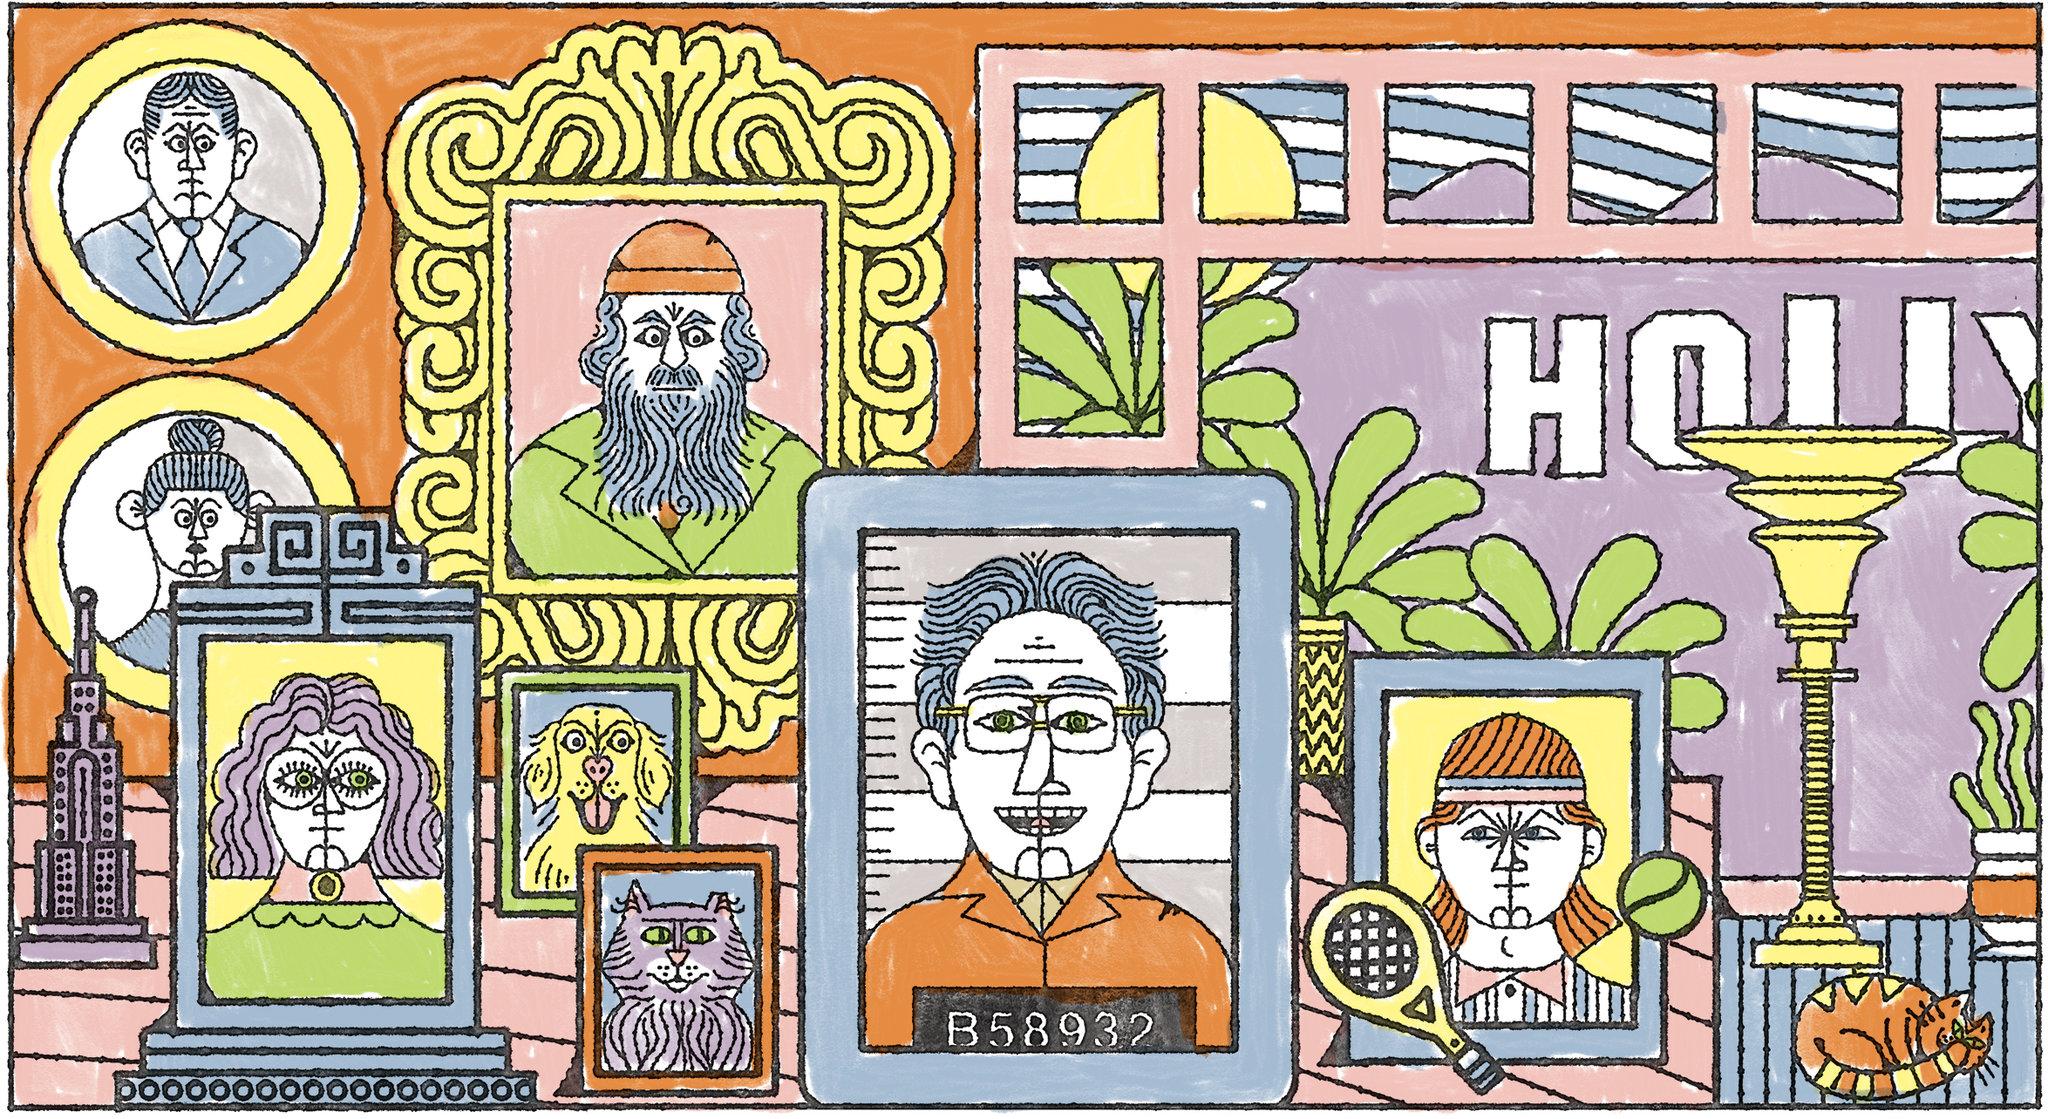 A Debut Novel Follows a Financial Scandal to a Gossipy.